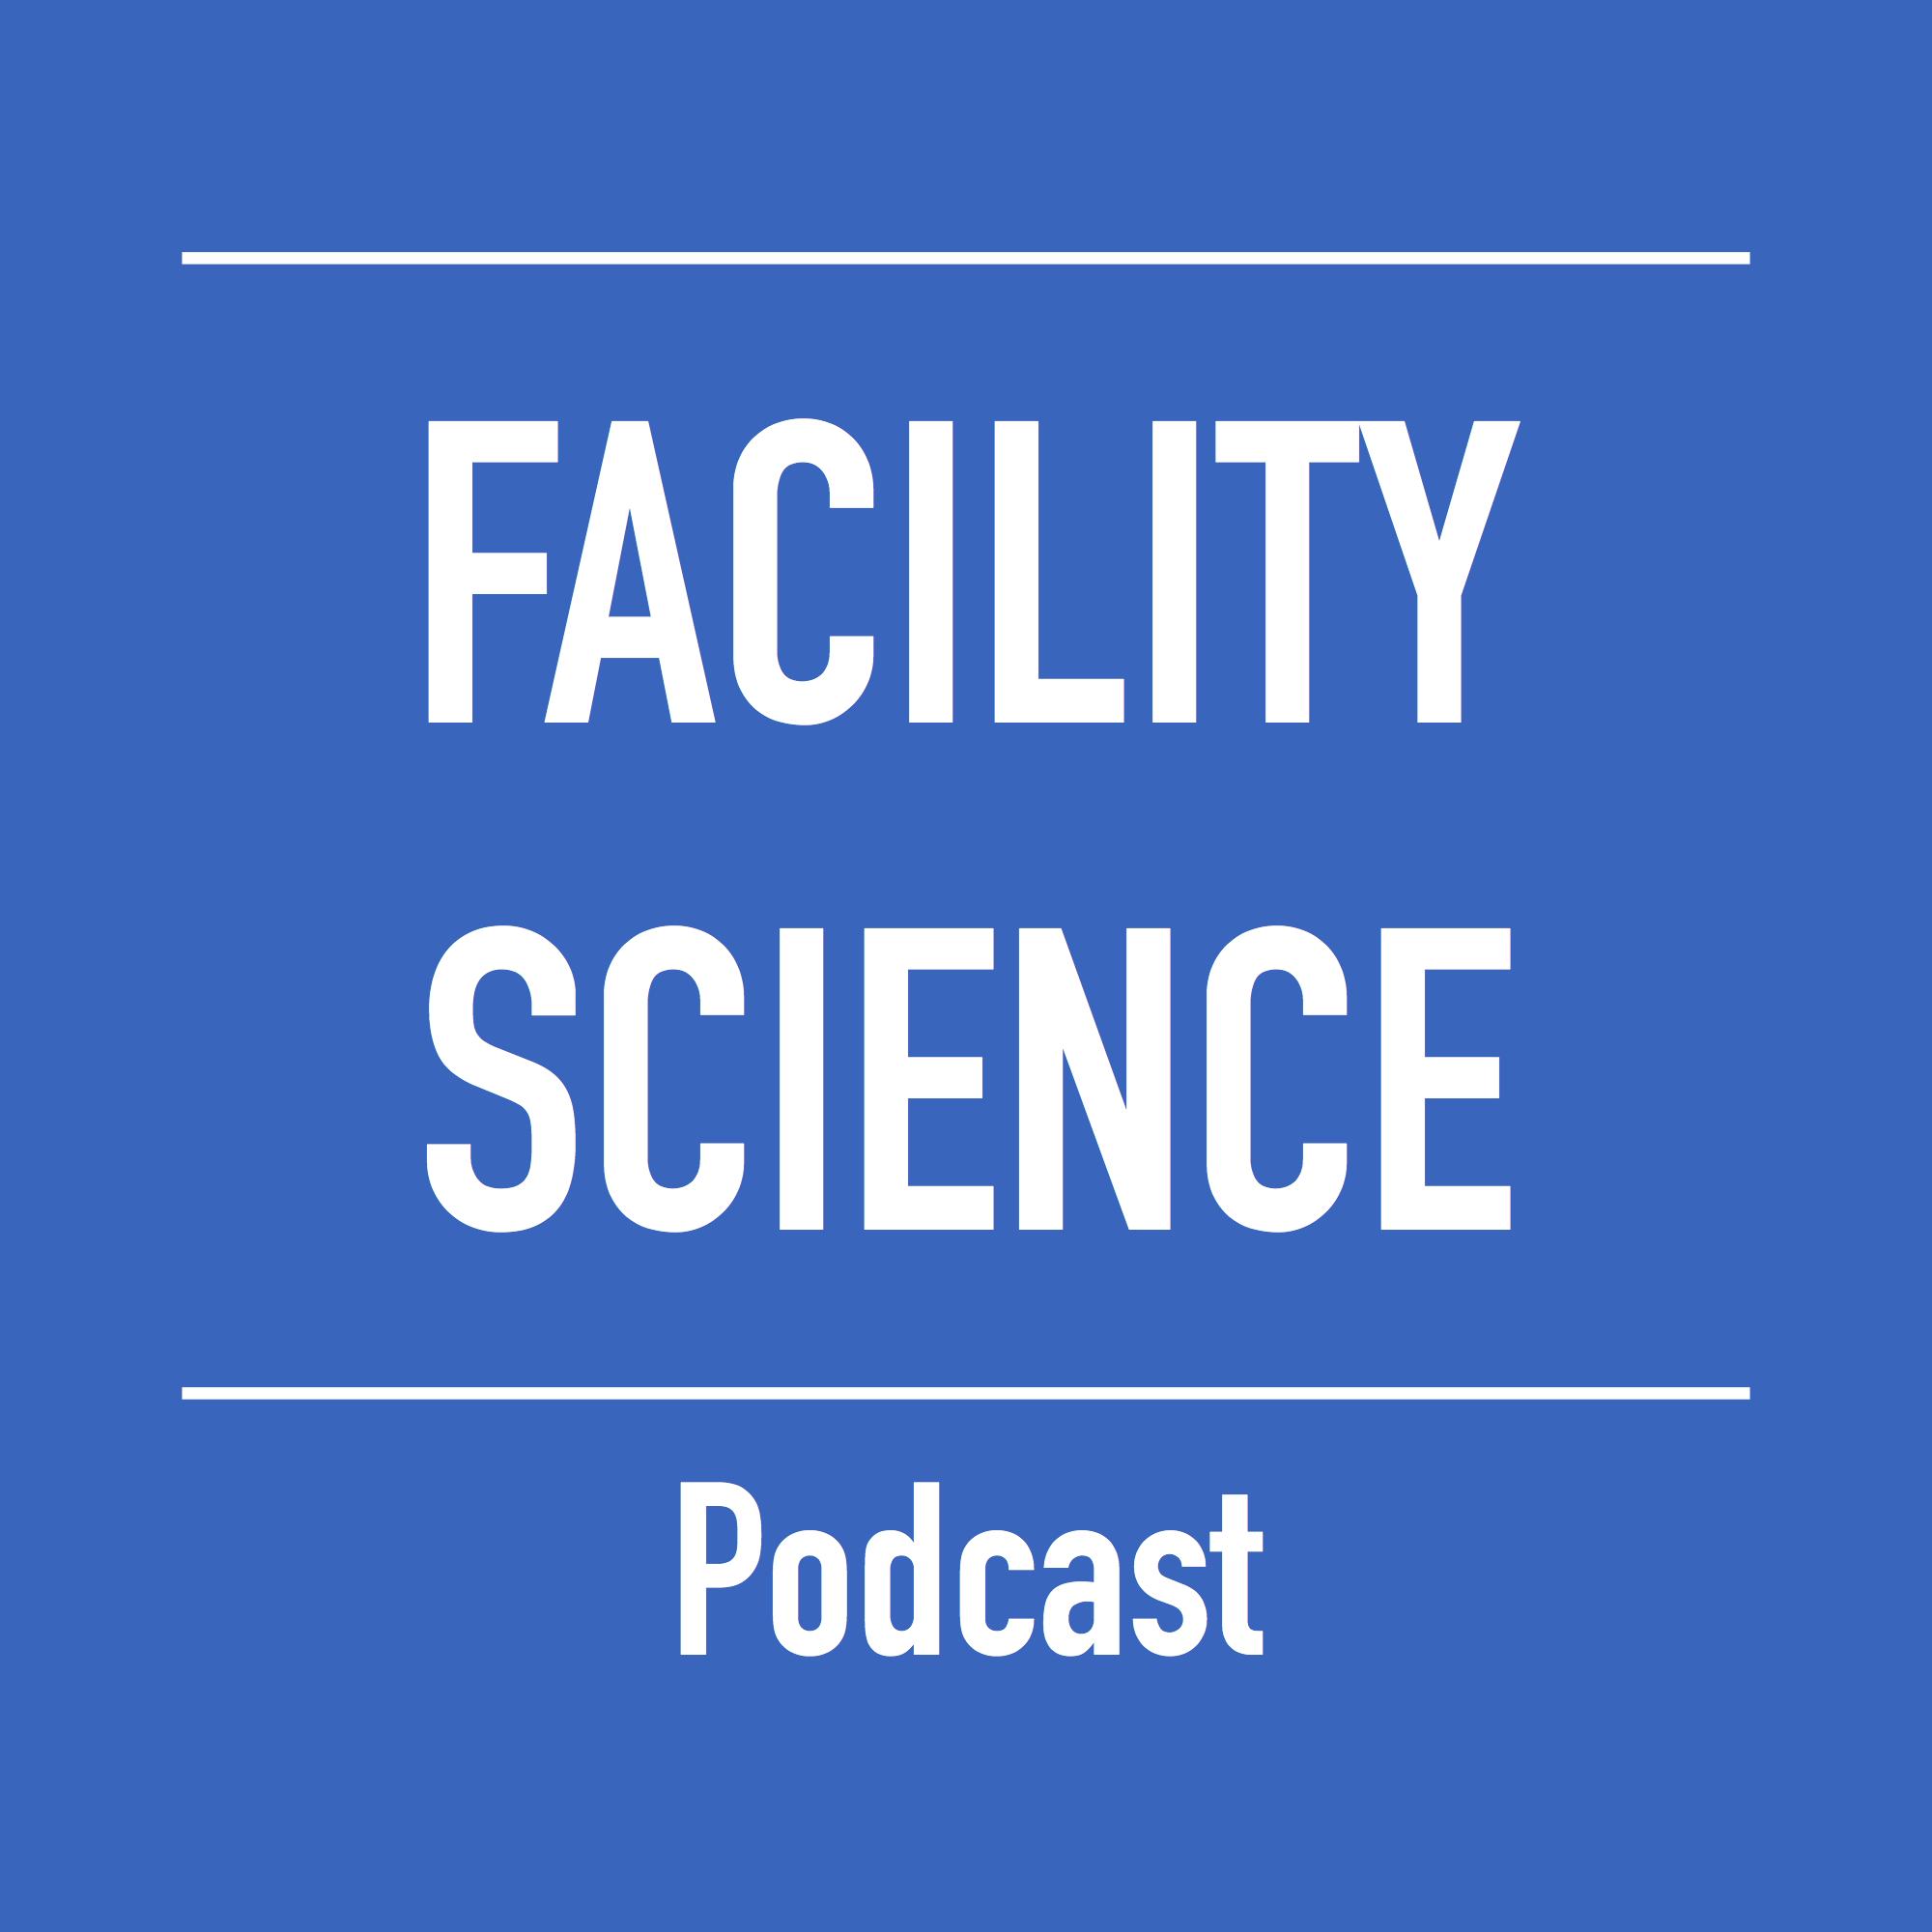 Facility Science Podcast show art